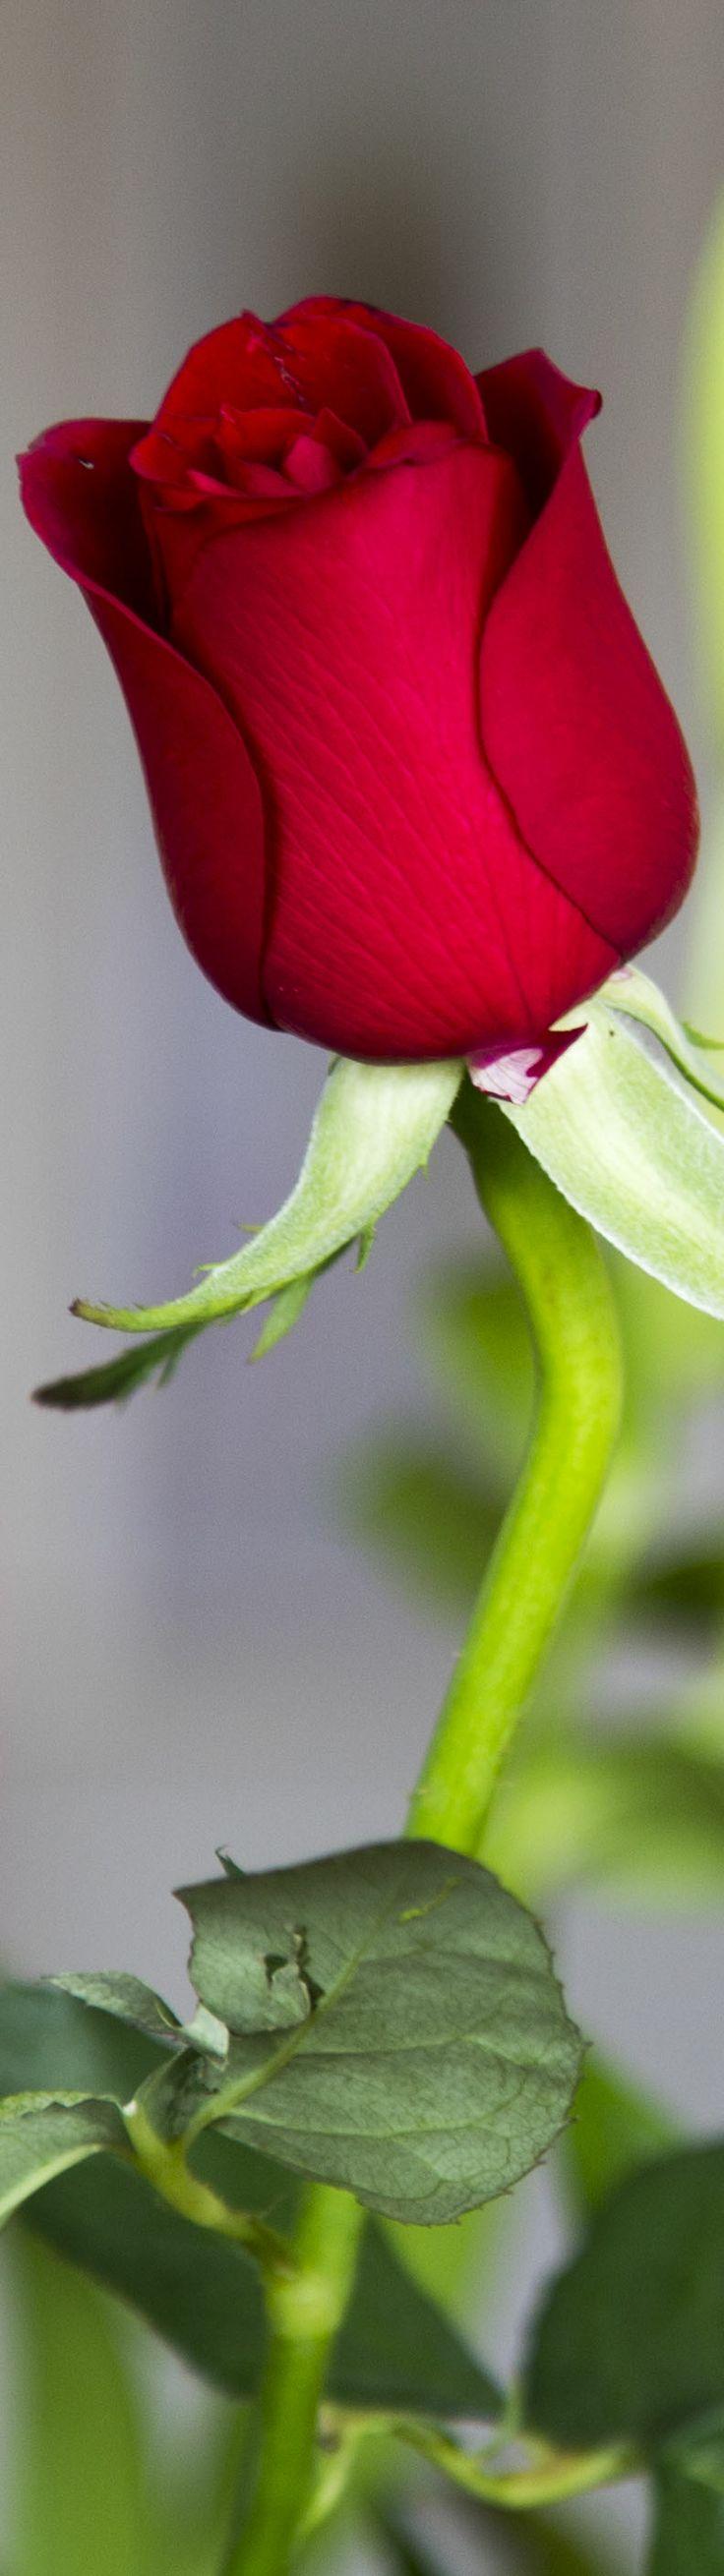 red rose flower for her